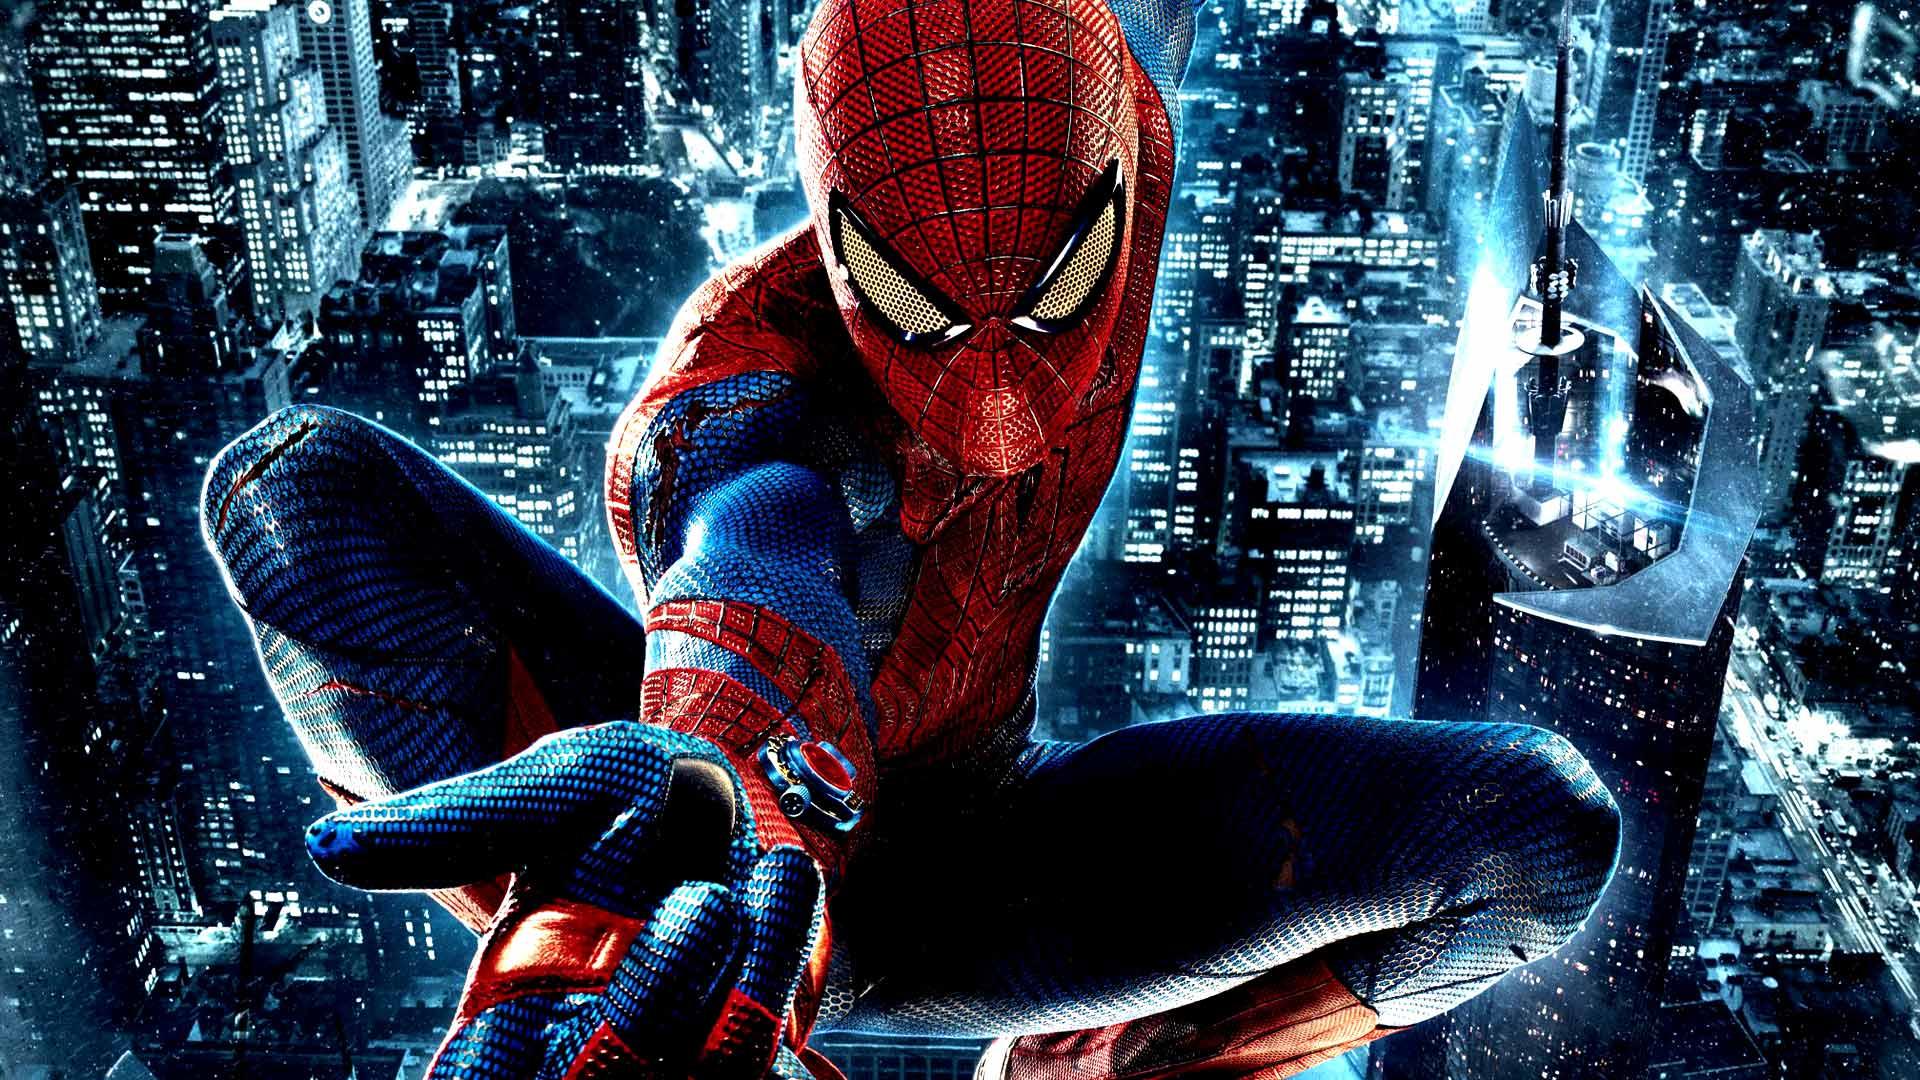 Amazing Spider Man 2 Wallpaper Full HD